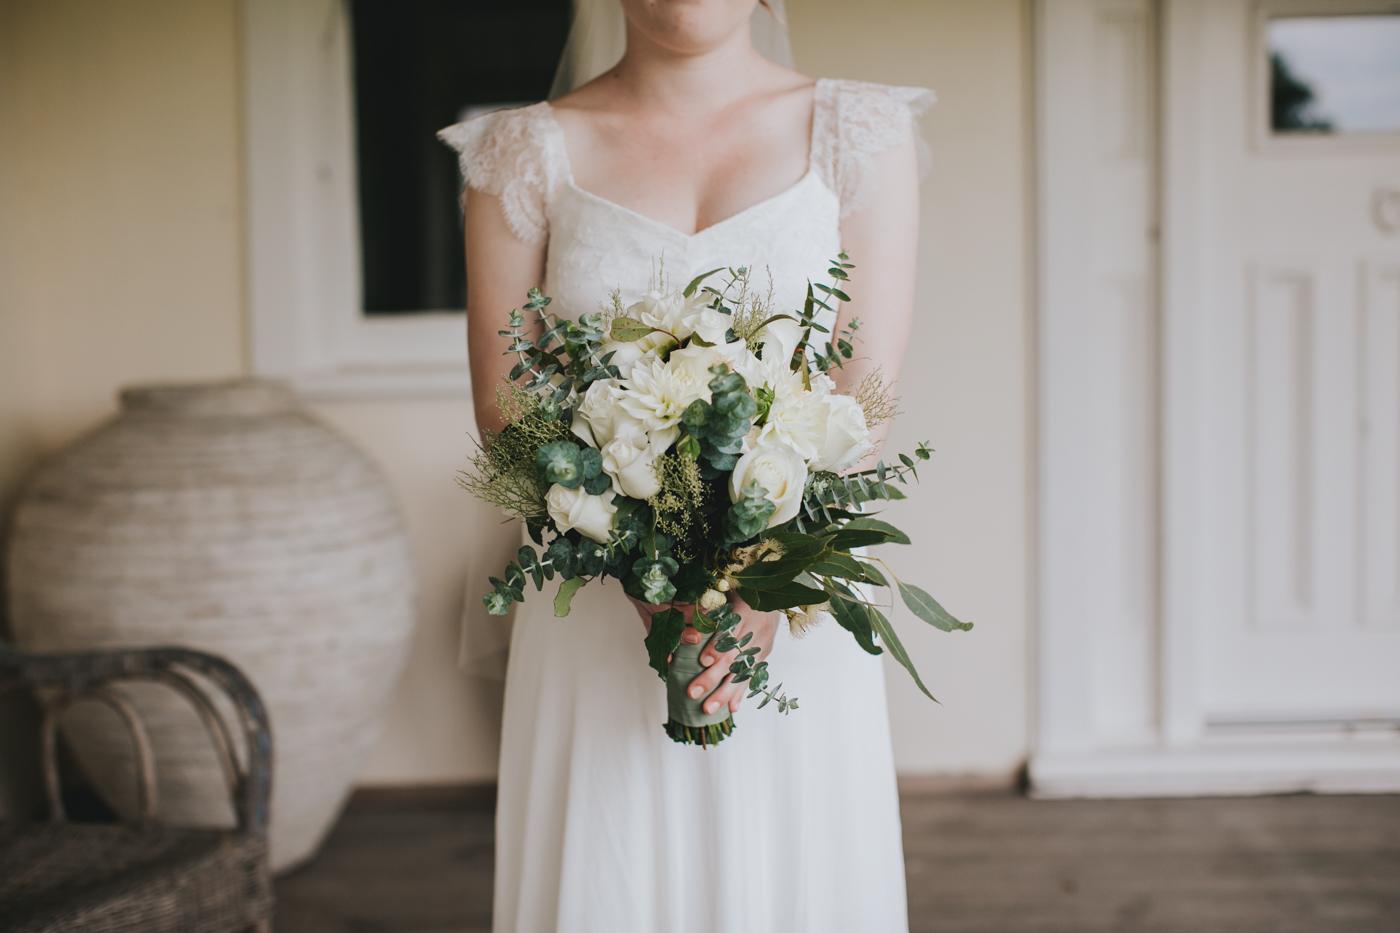 Rachel & Jacob - Willow Farm Berry - South Coast Wedding - Samantha Heather Photography-41.jpg